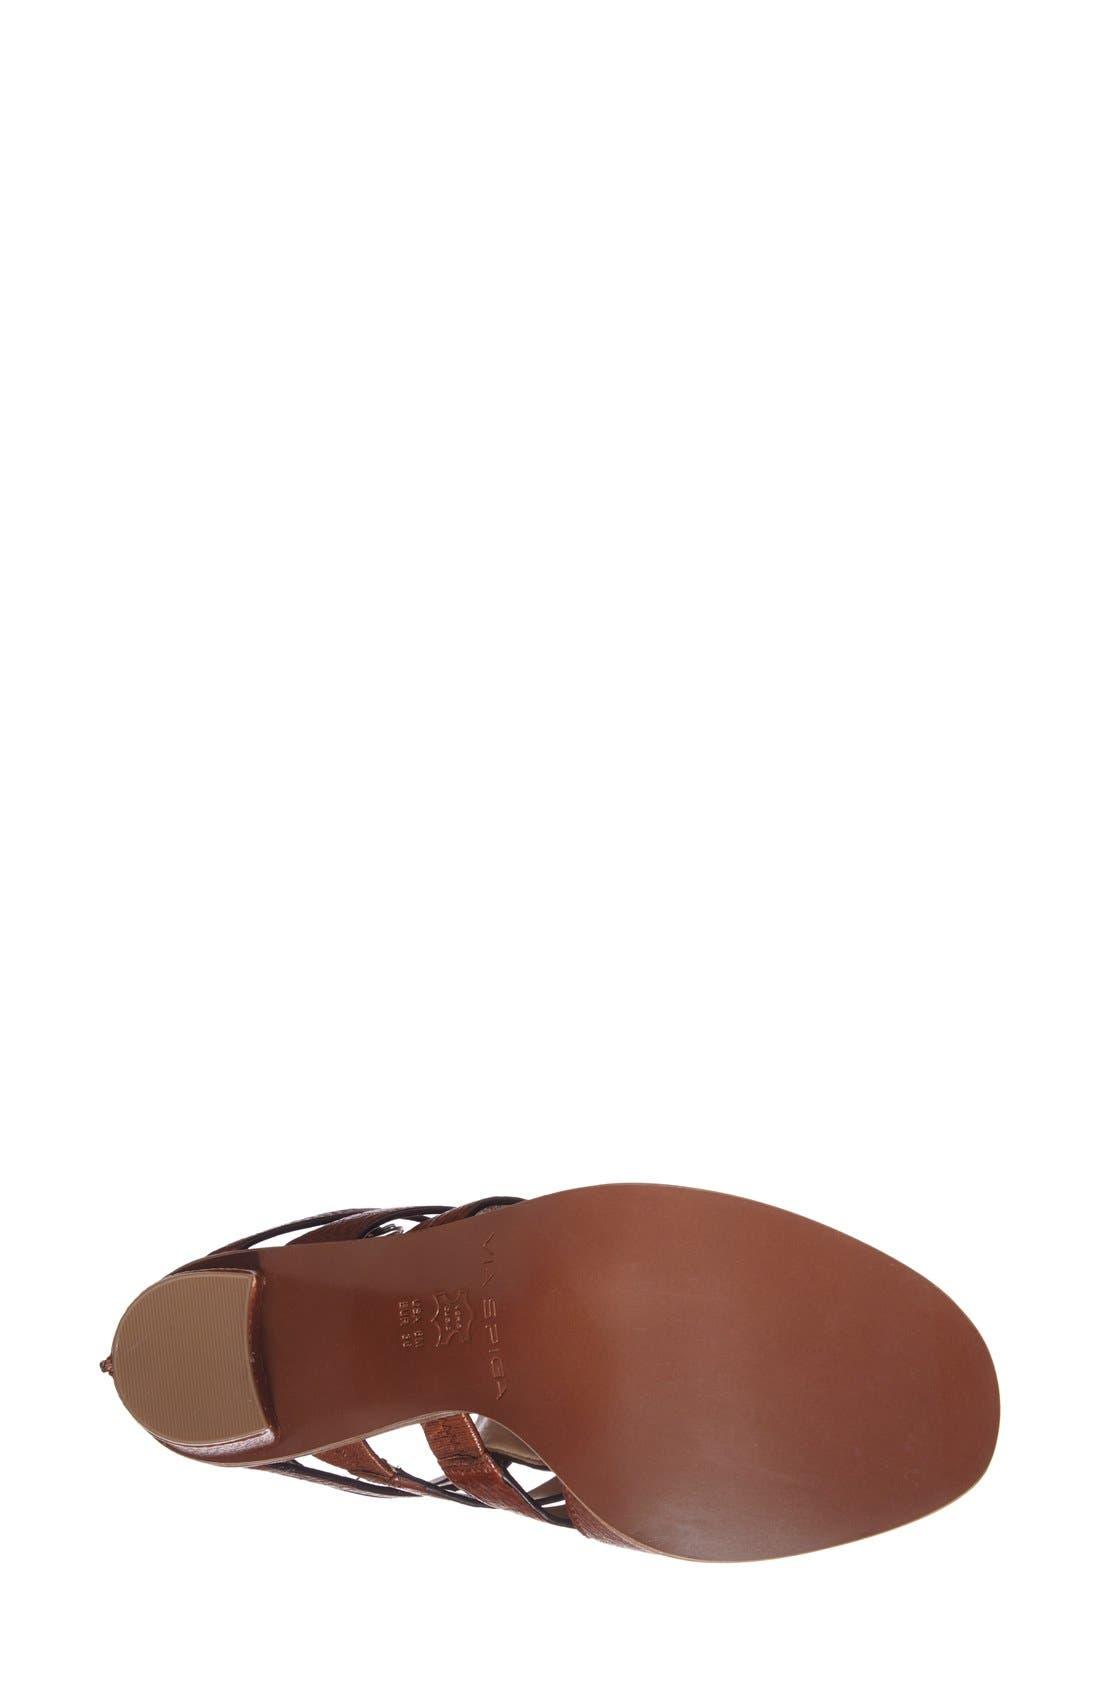 Alternate Image 4  - Via Spiga 'Brandina' Leather Sandal (Women)